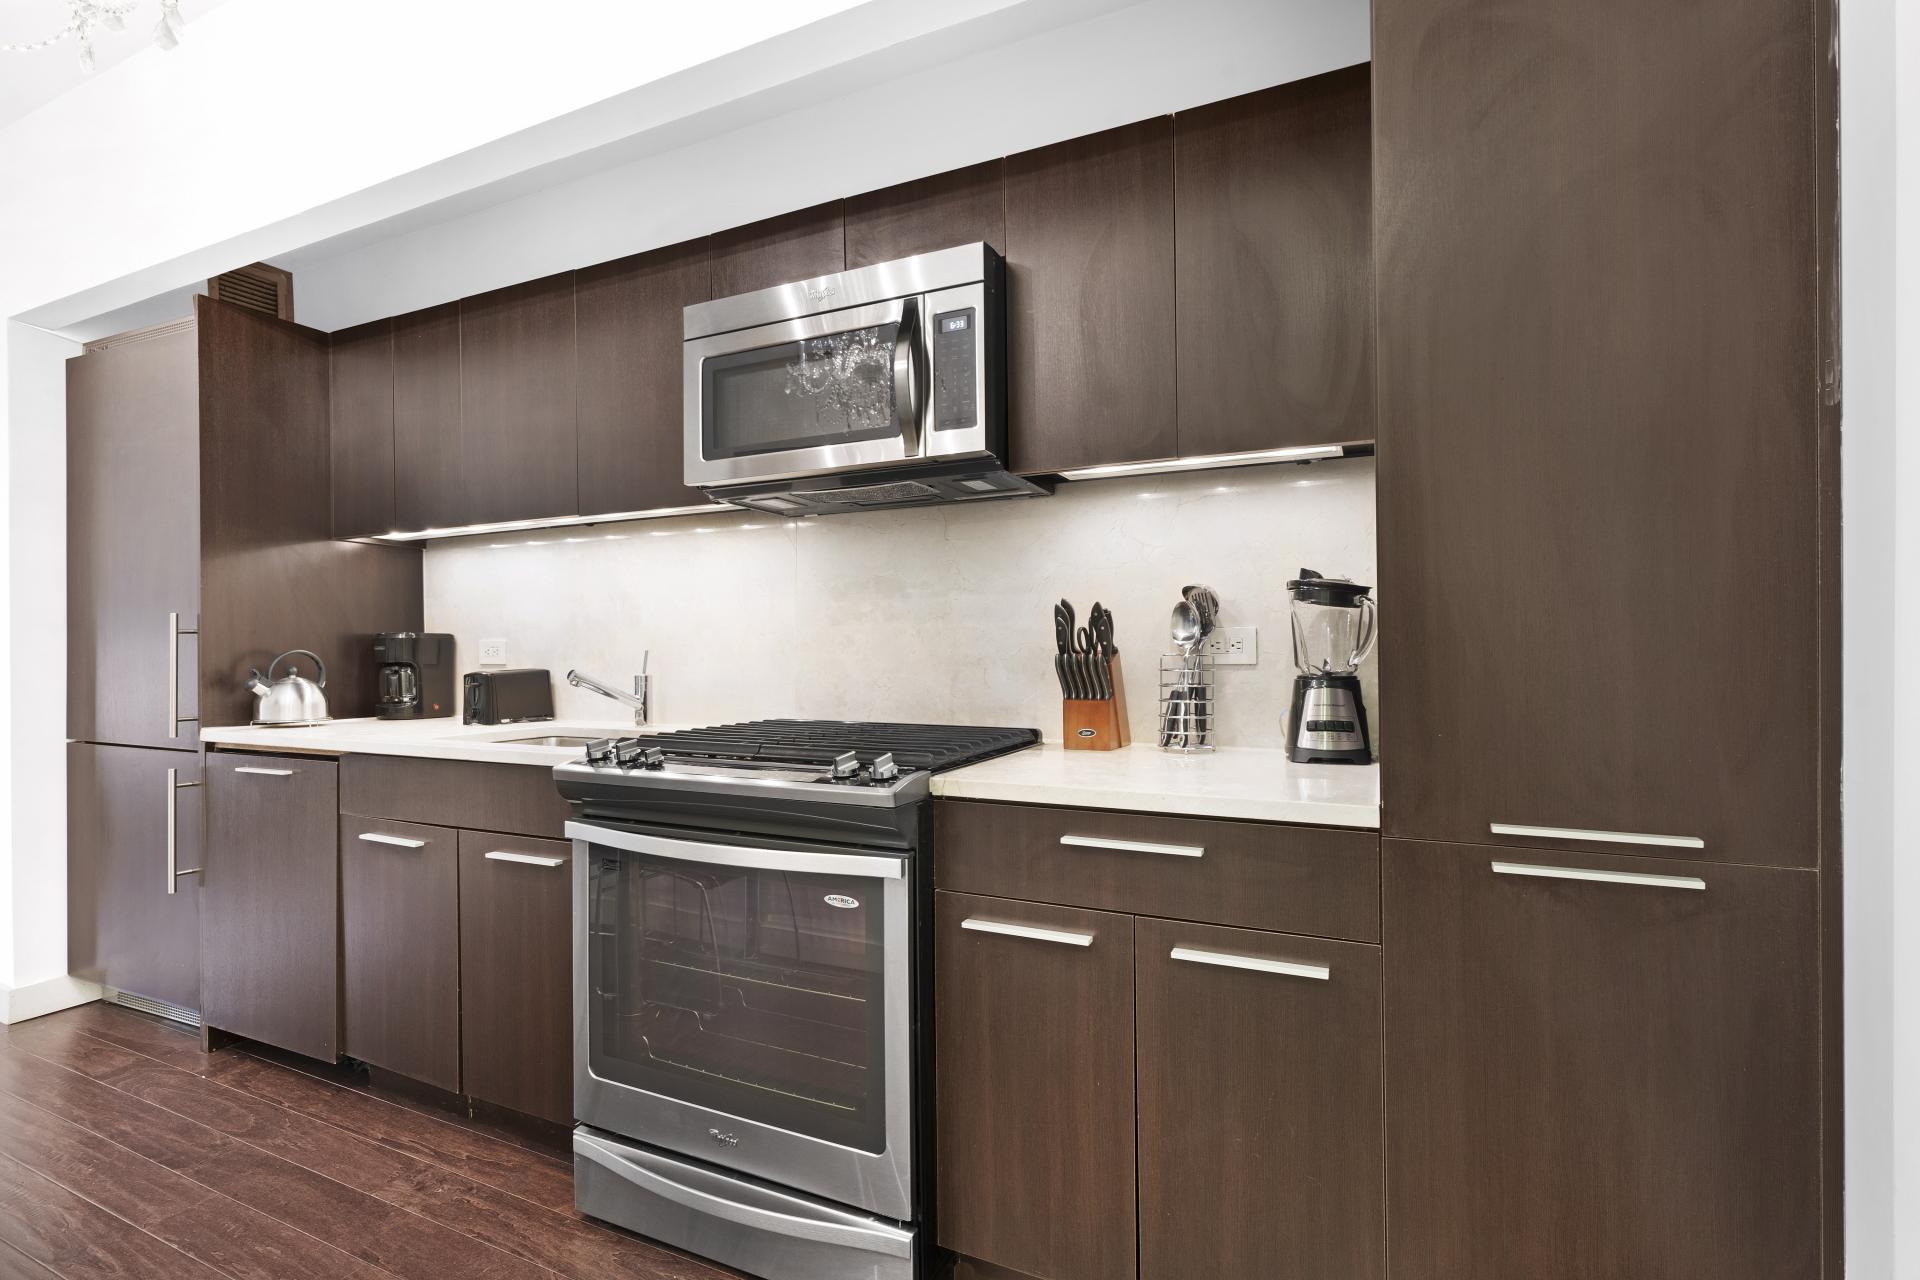 Kitchen at 95 Wall Apartments, Financial District, Manhattan